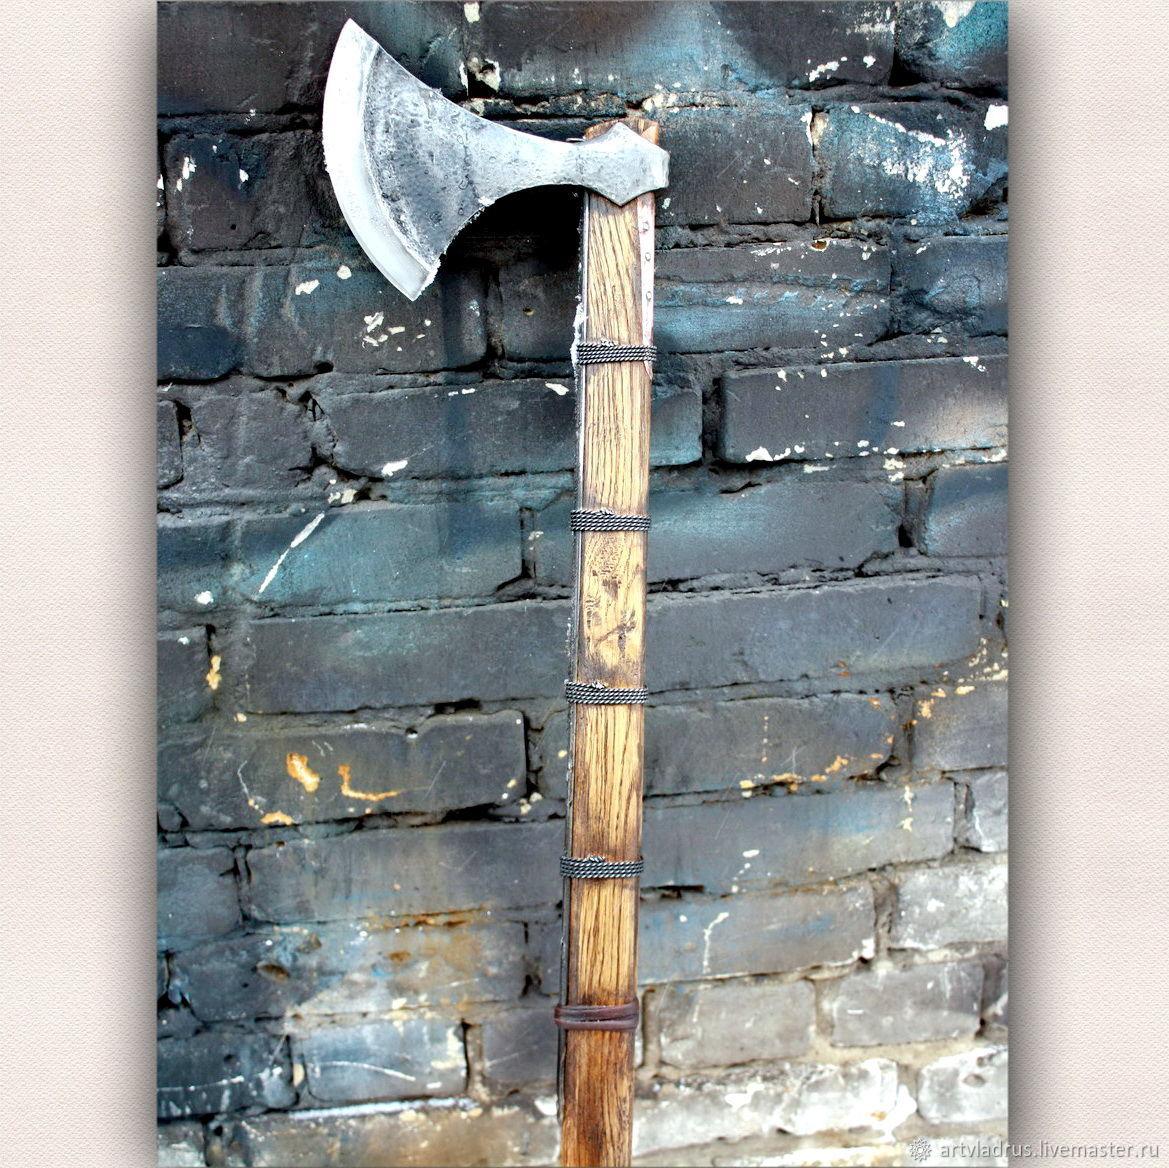 Секира Бродэкс, Сувенирное оружие, Александров,  Фото №1